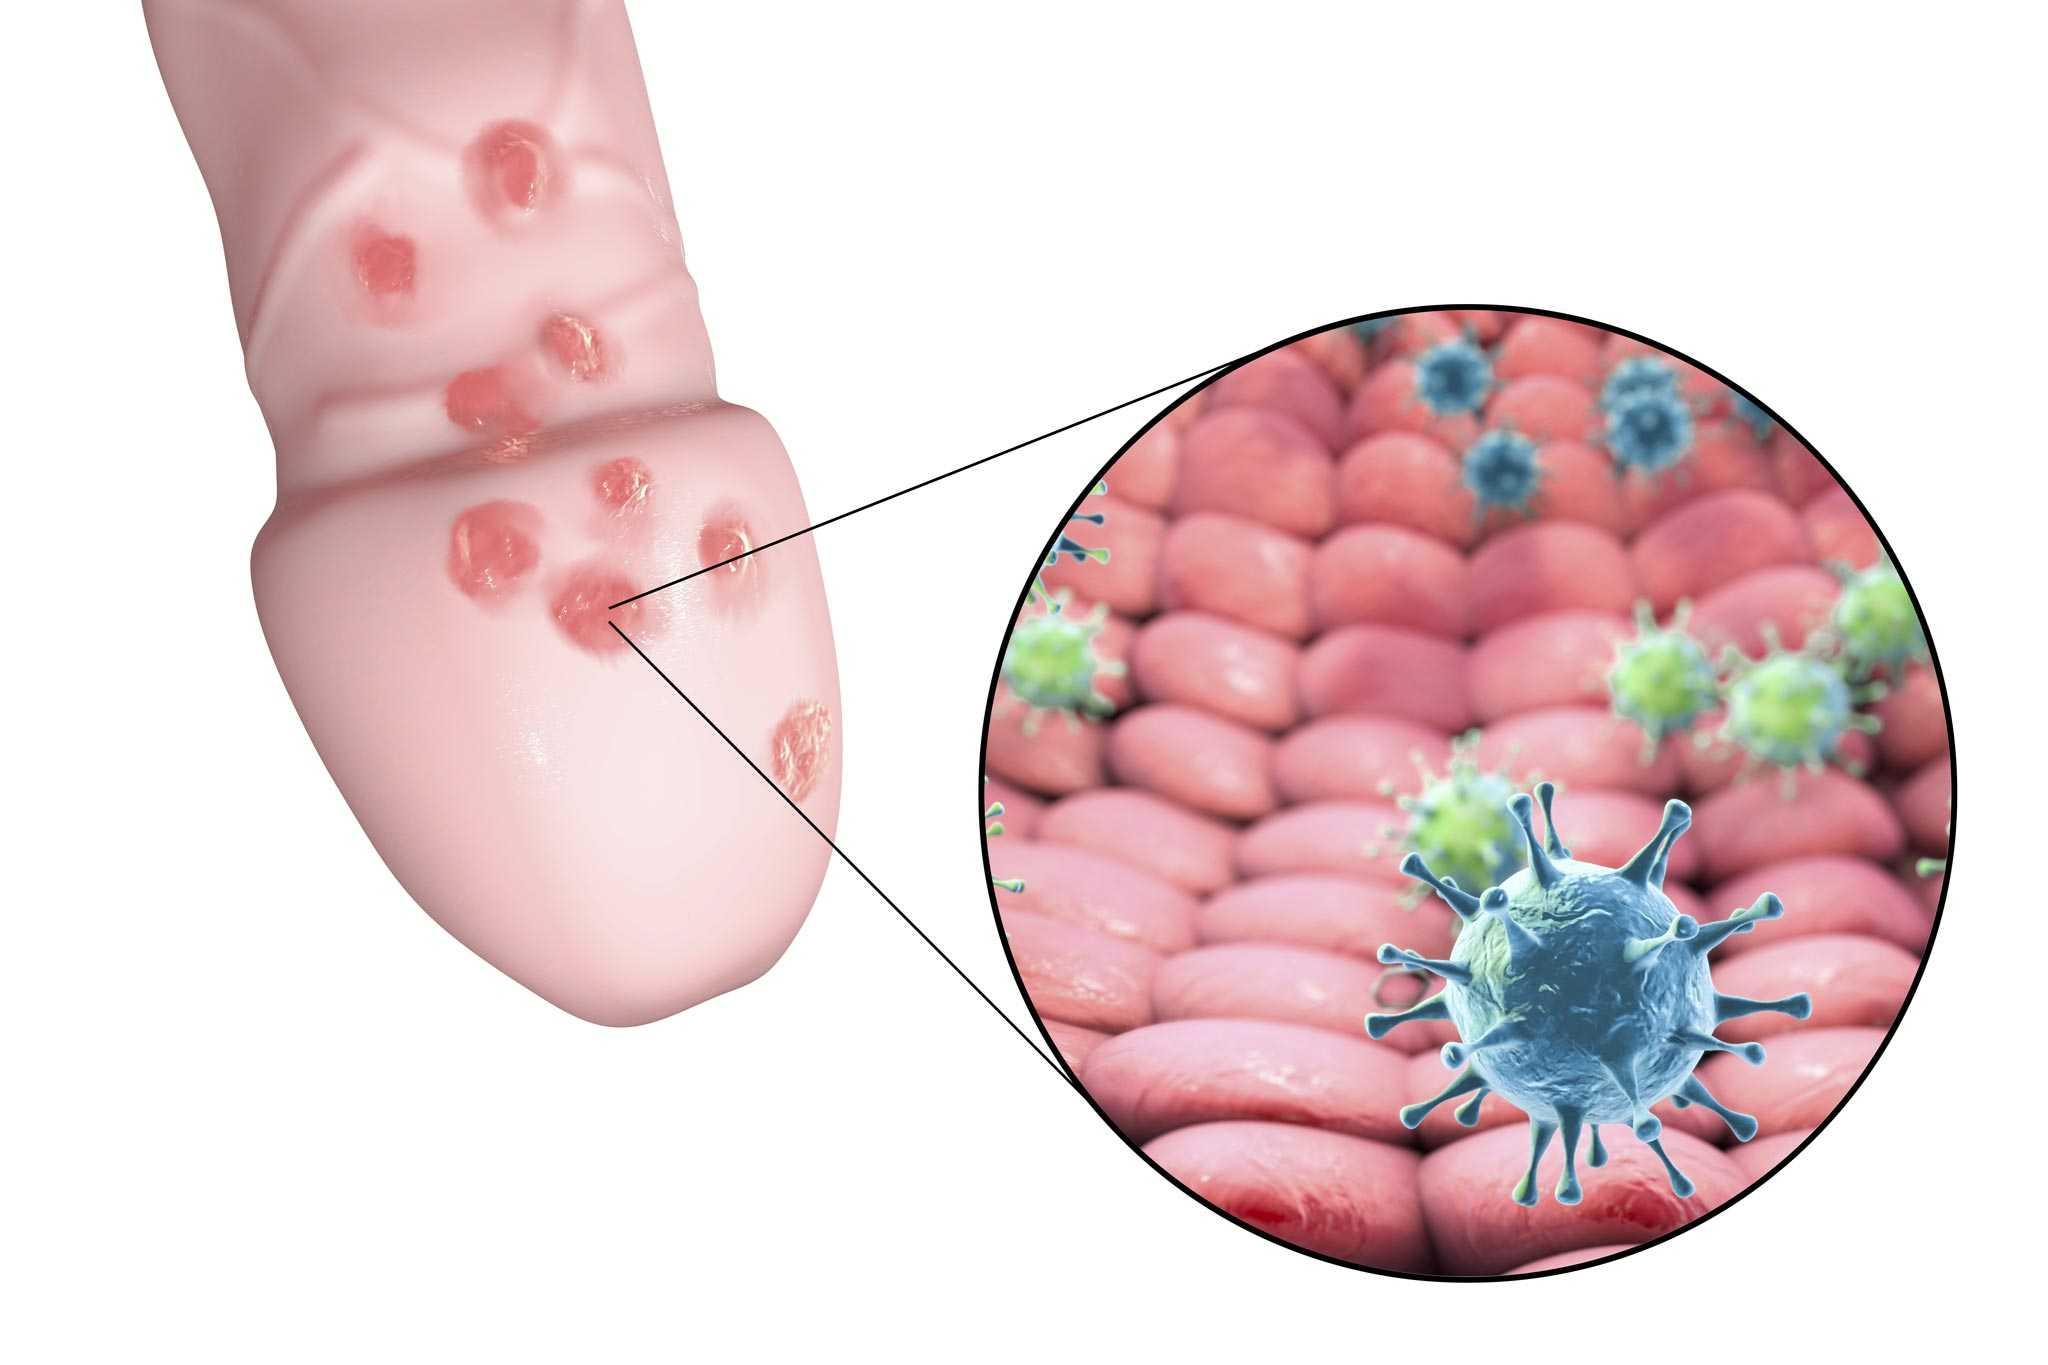 Genitalherpes » Ursachen, Beschwerden, Behandlung